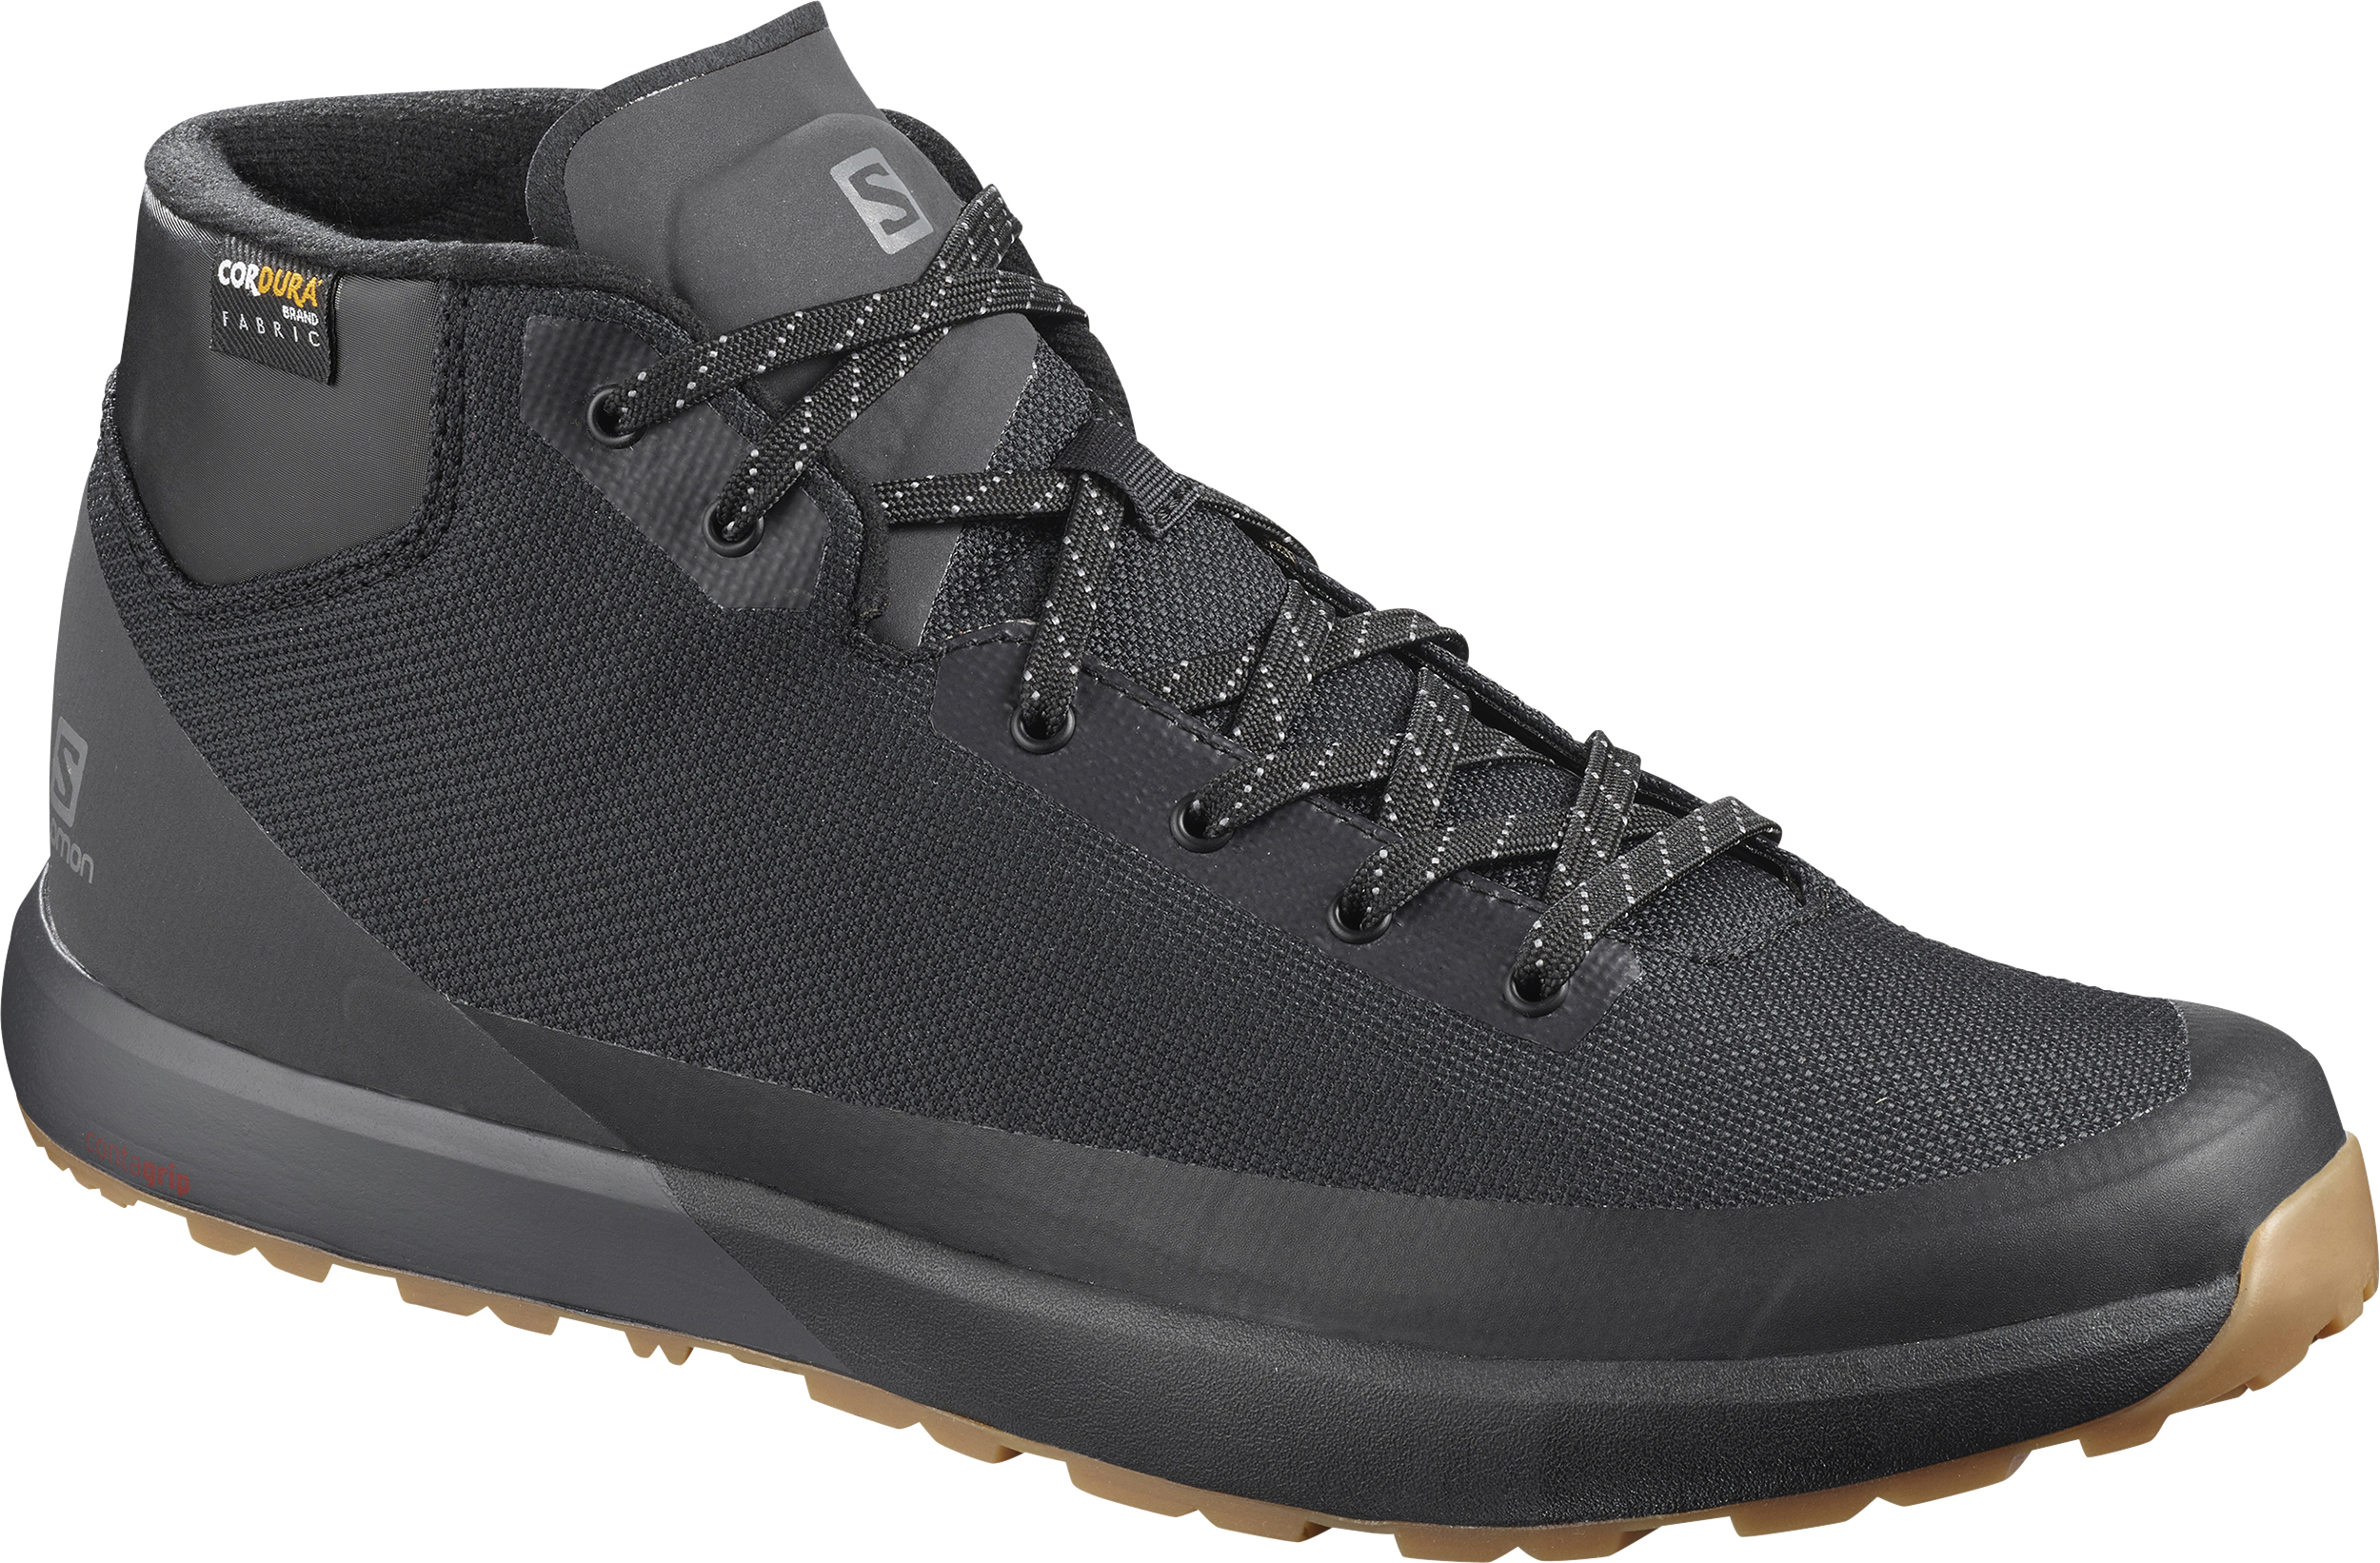 e95186b0 Salomon Men's Boots   MEC